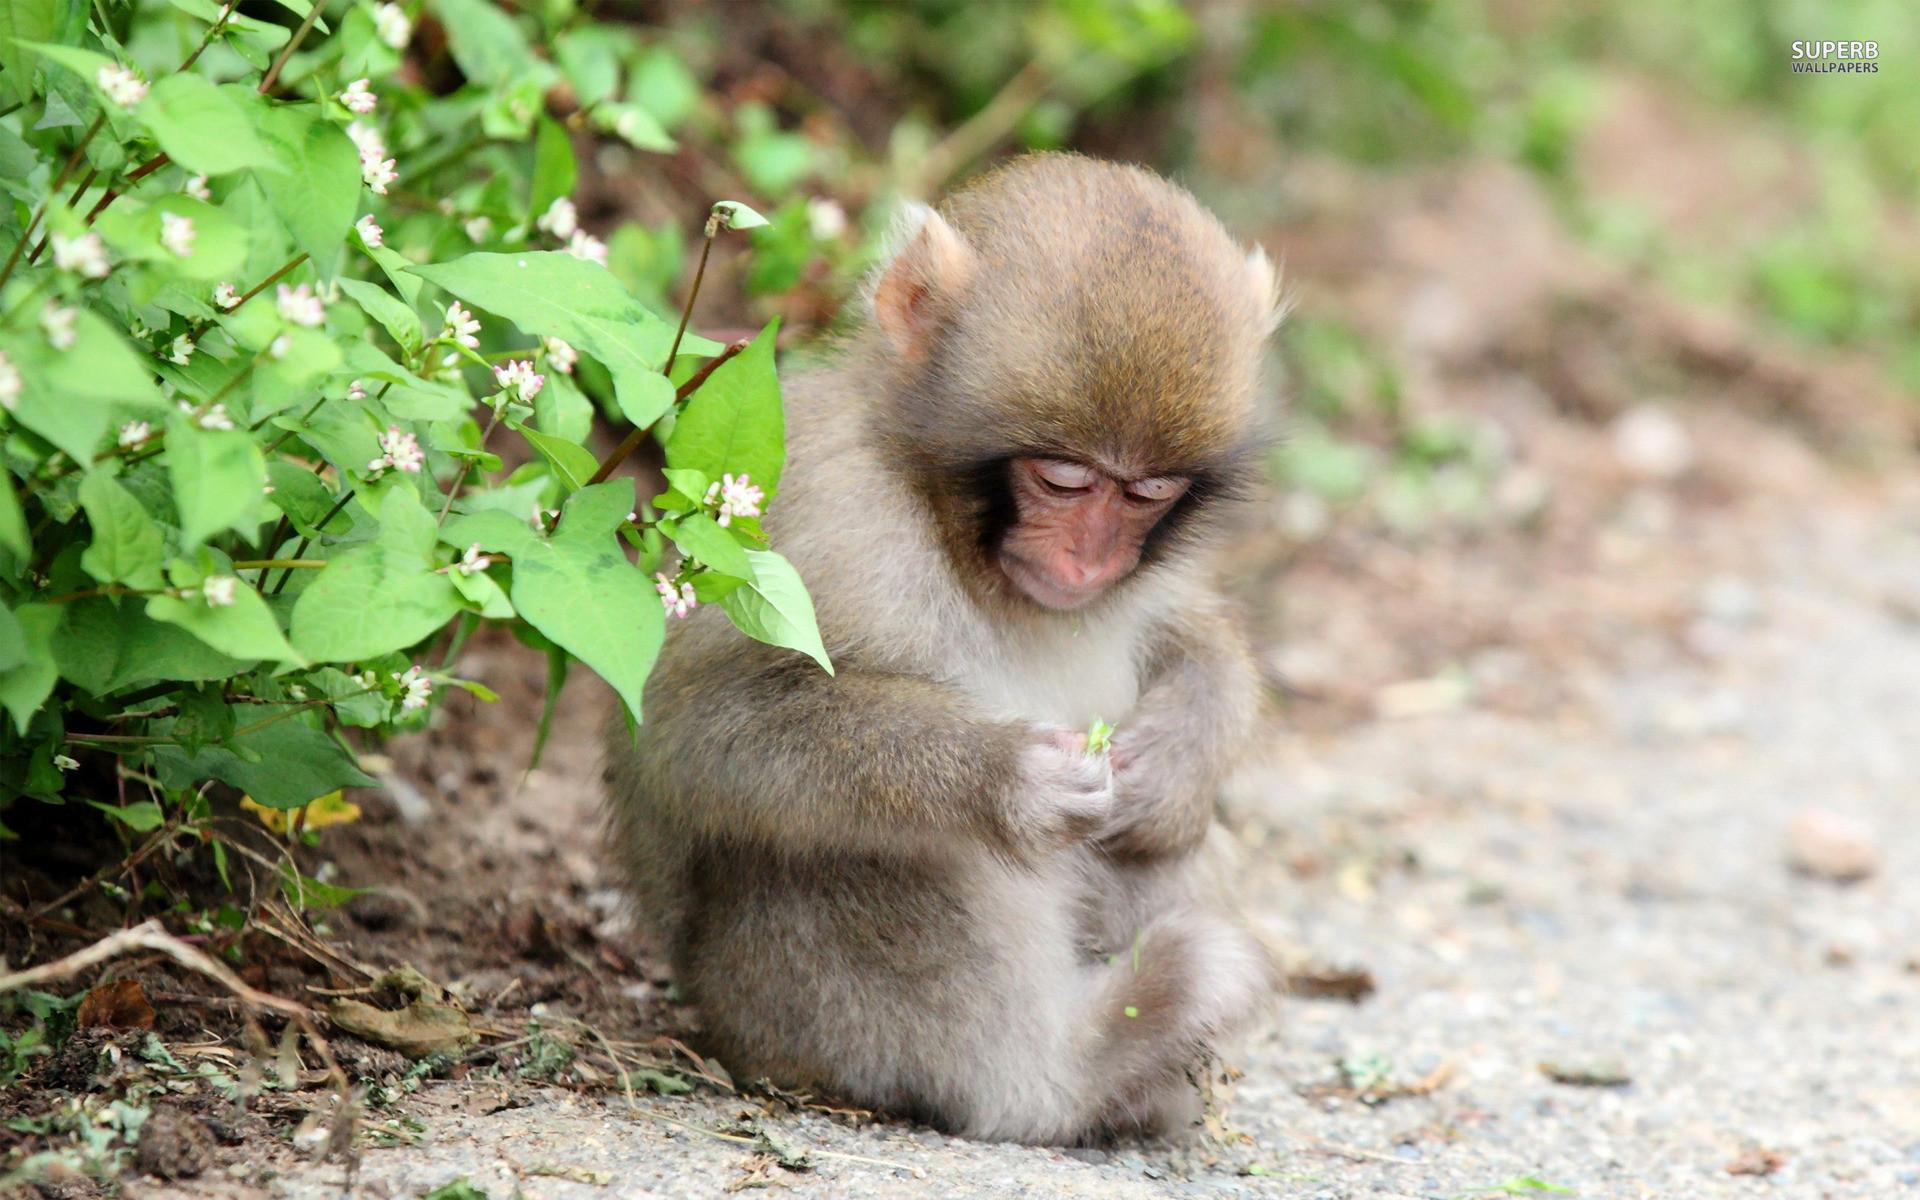 High Resolution Monkey Cute Baby Wallpaper Full Size .